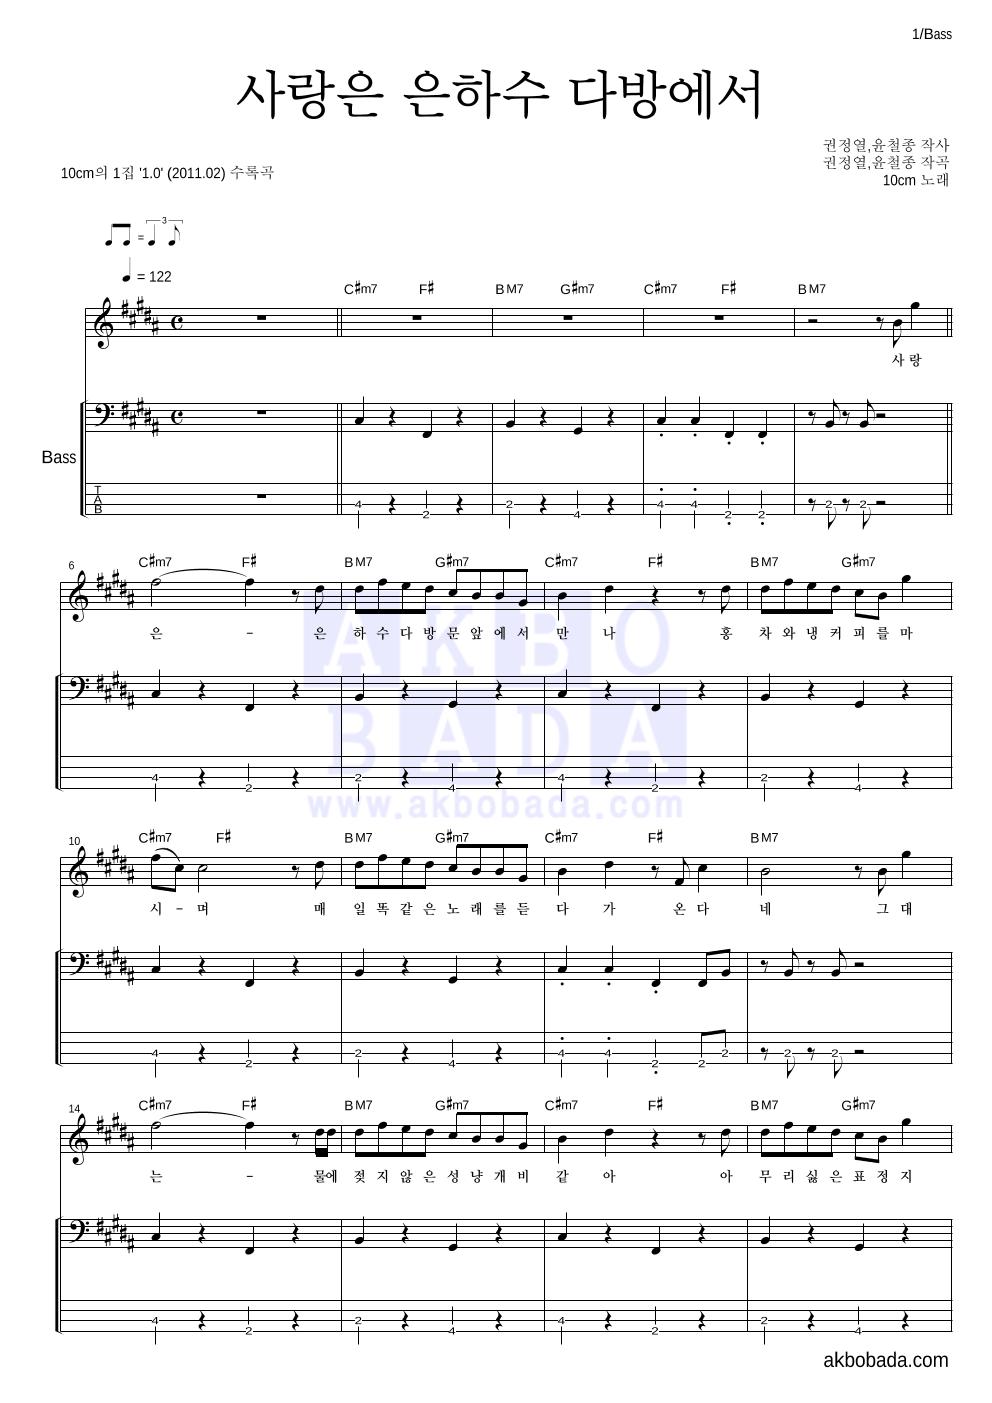 10CM - 사랑은 은하수 다방에서 베이스 악보